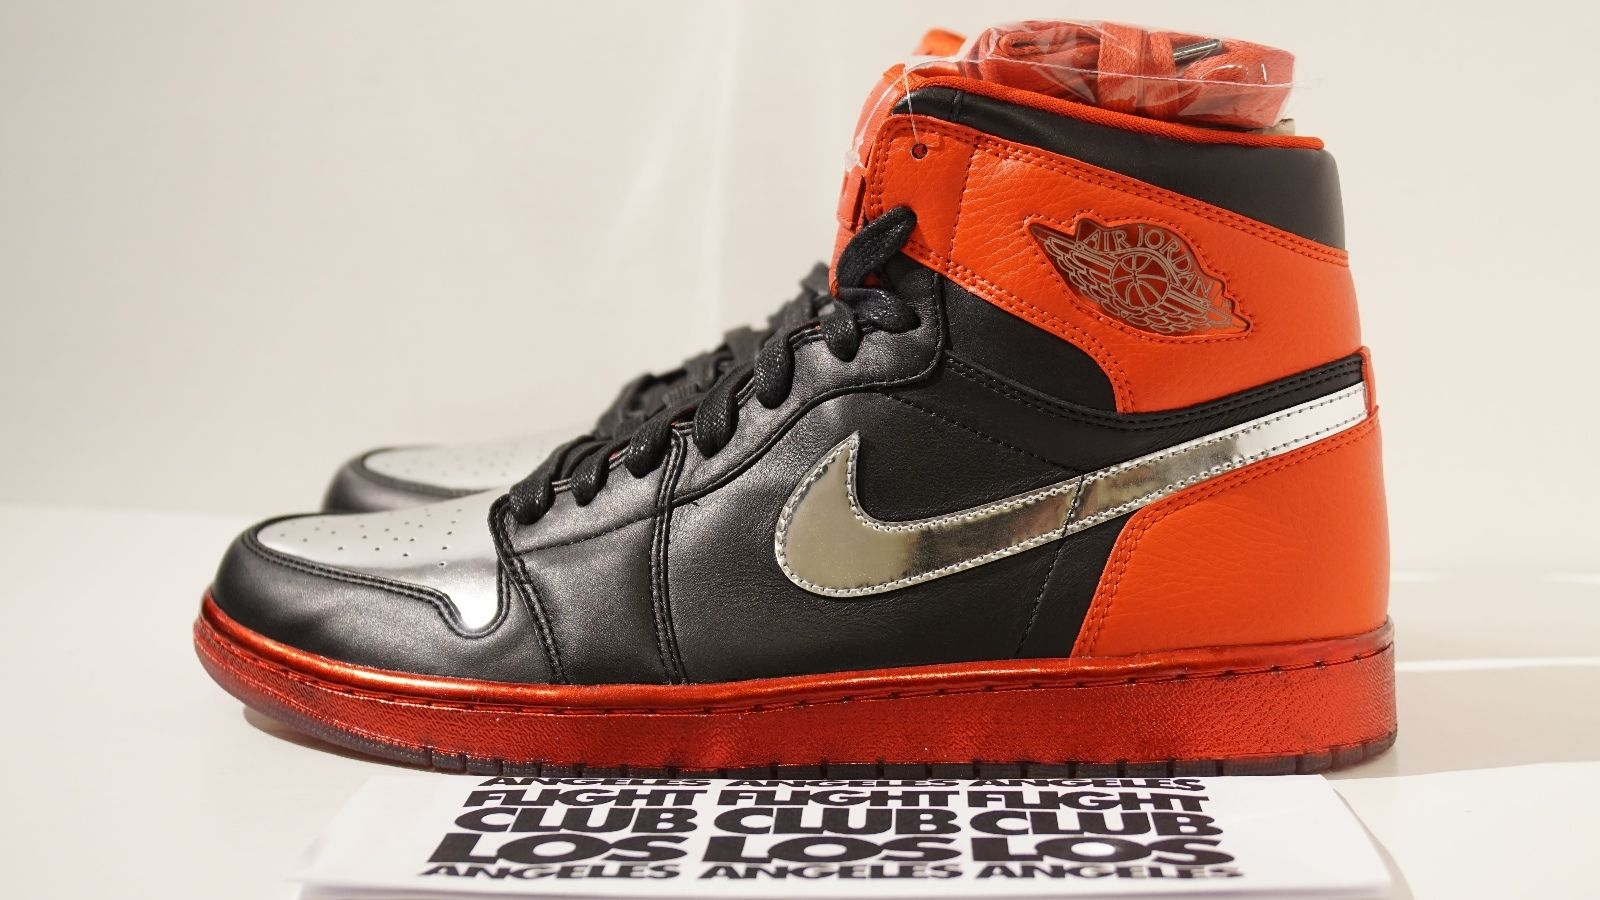 Most Expensive Jordan Shoes